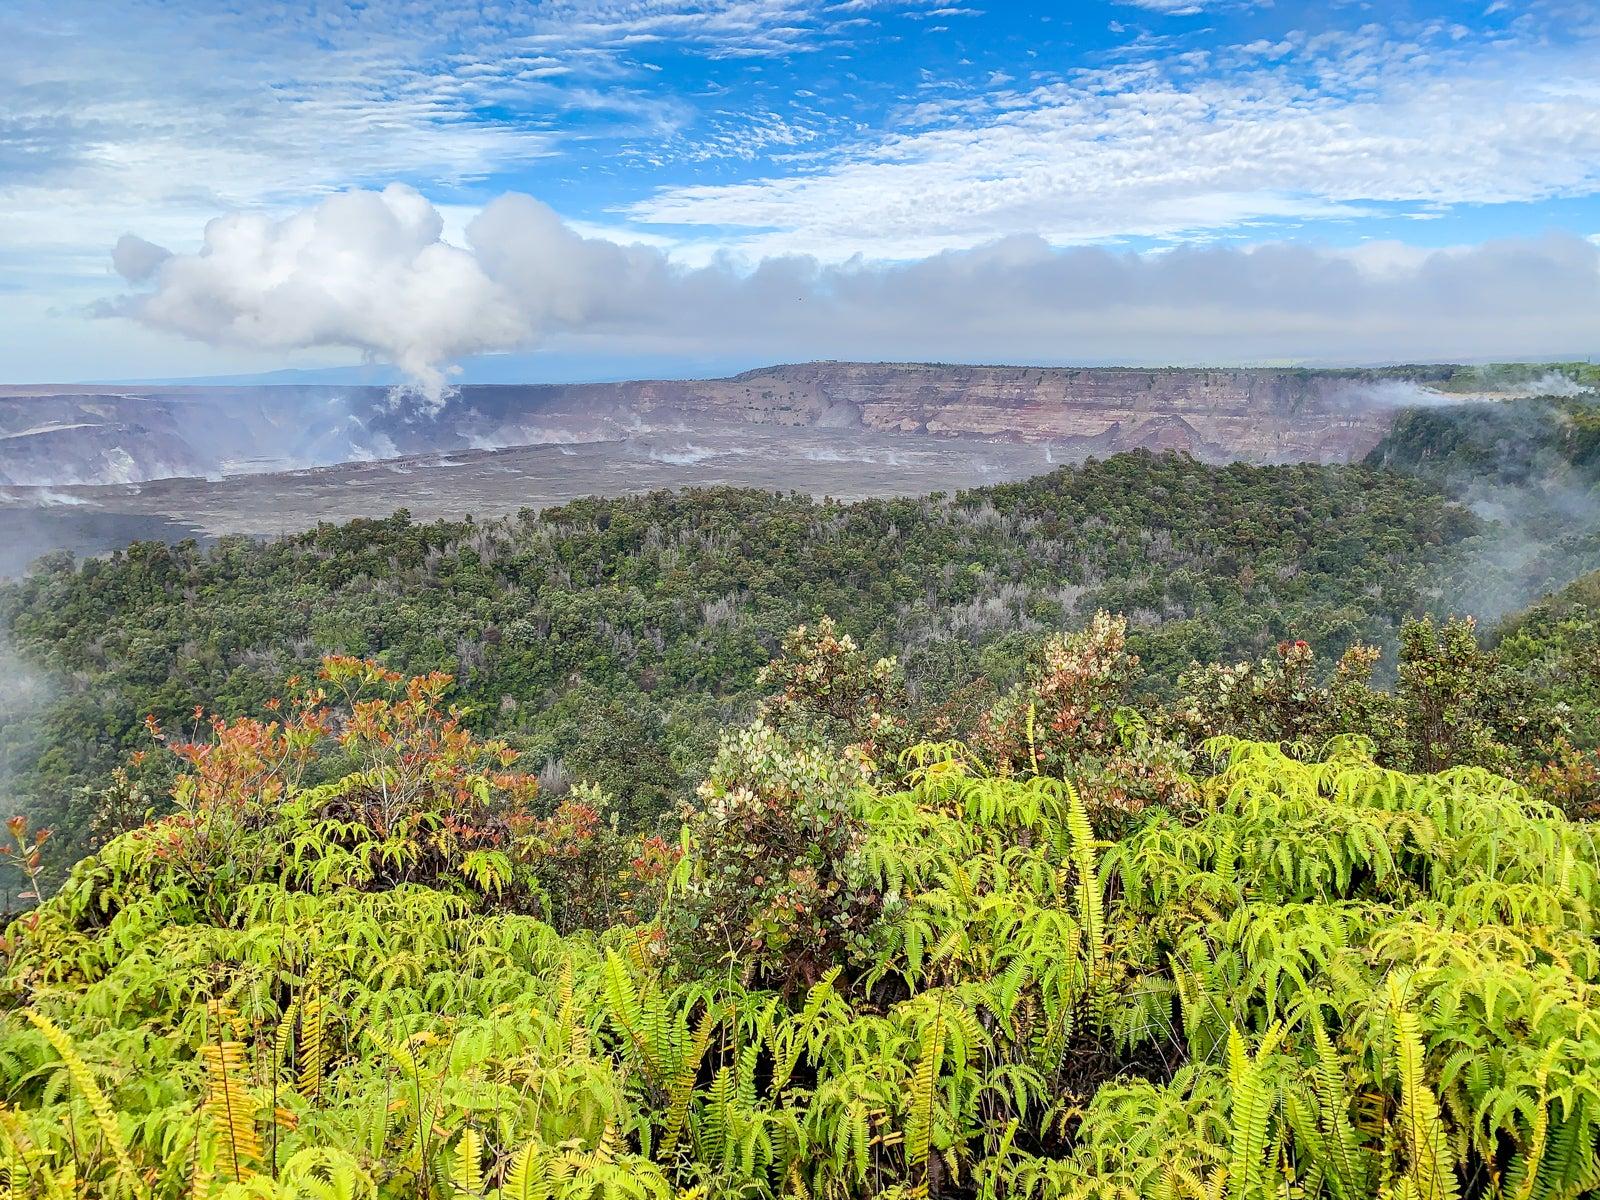 Tips for visiting Volcanoes National Park